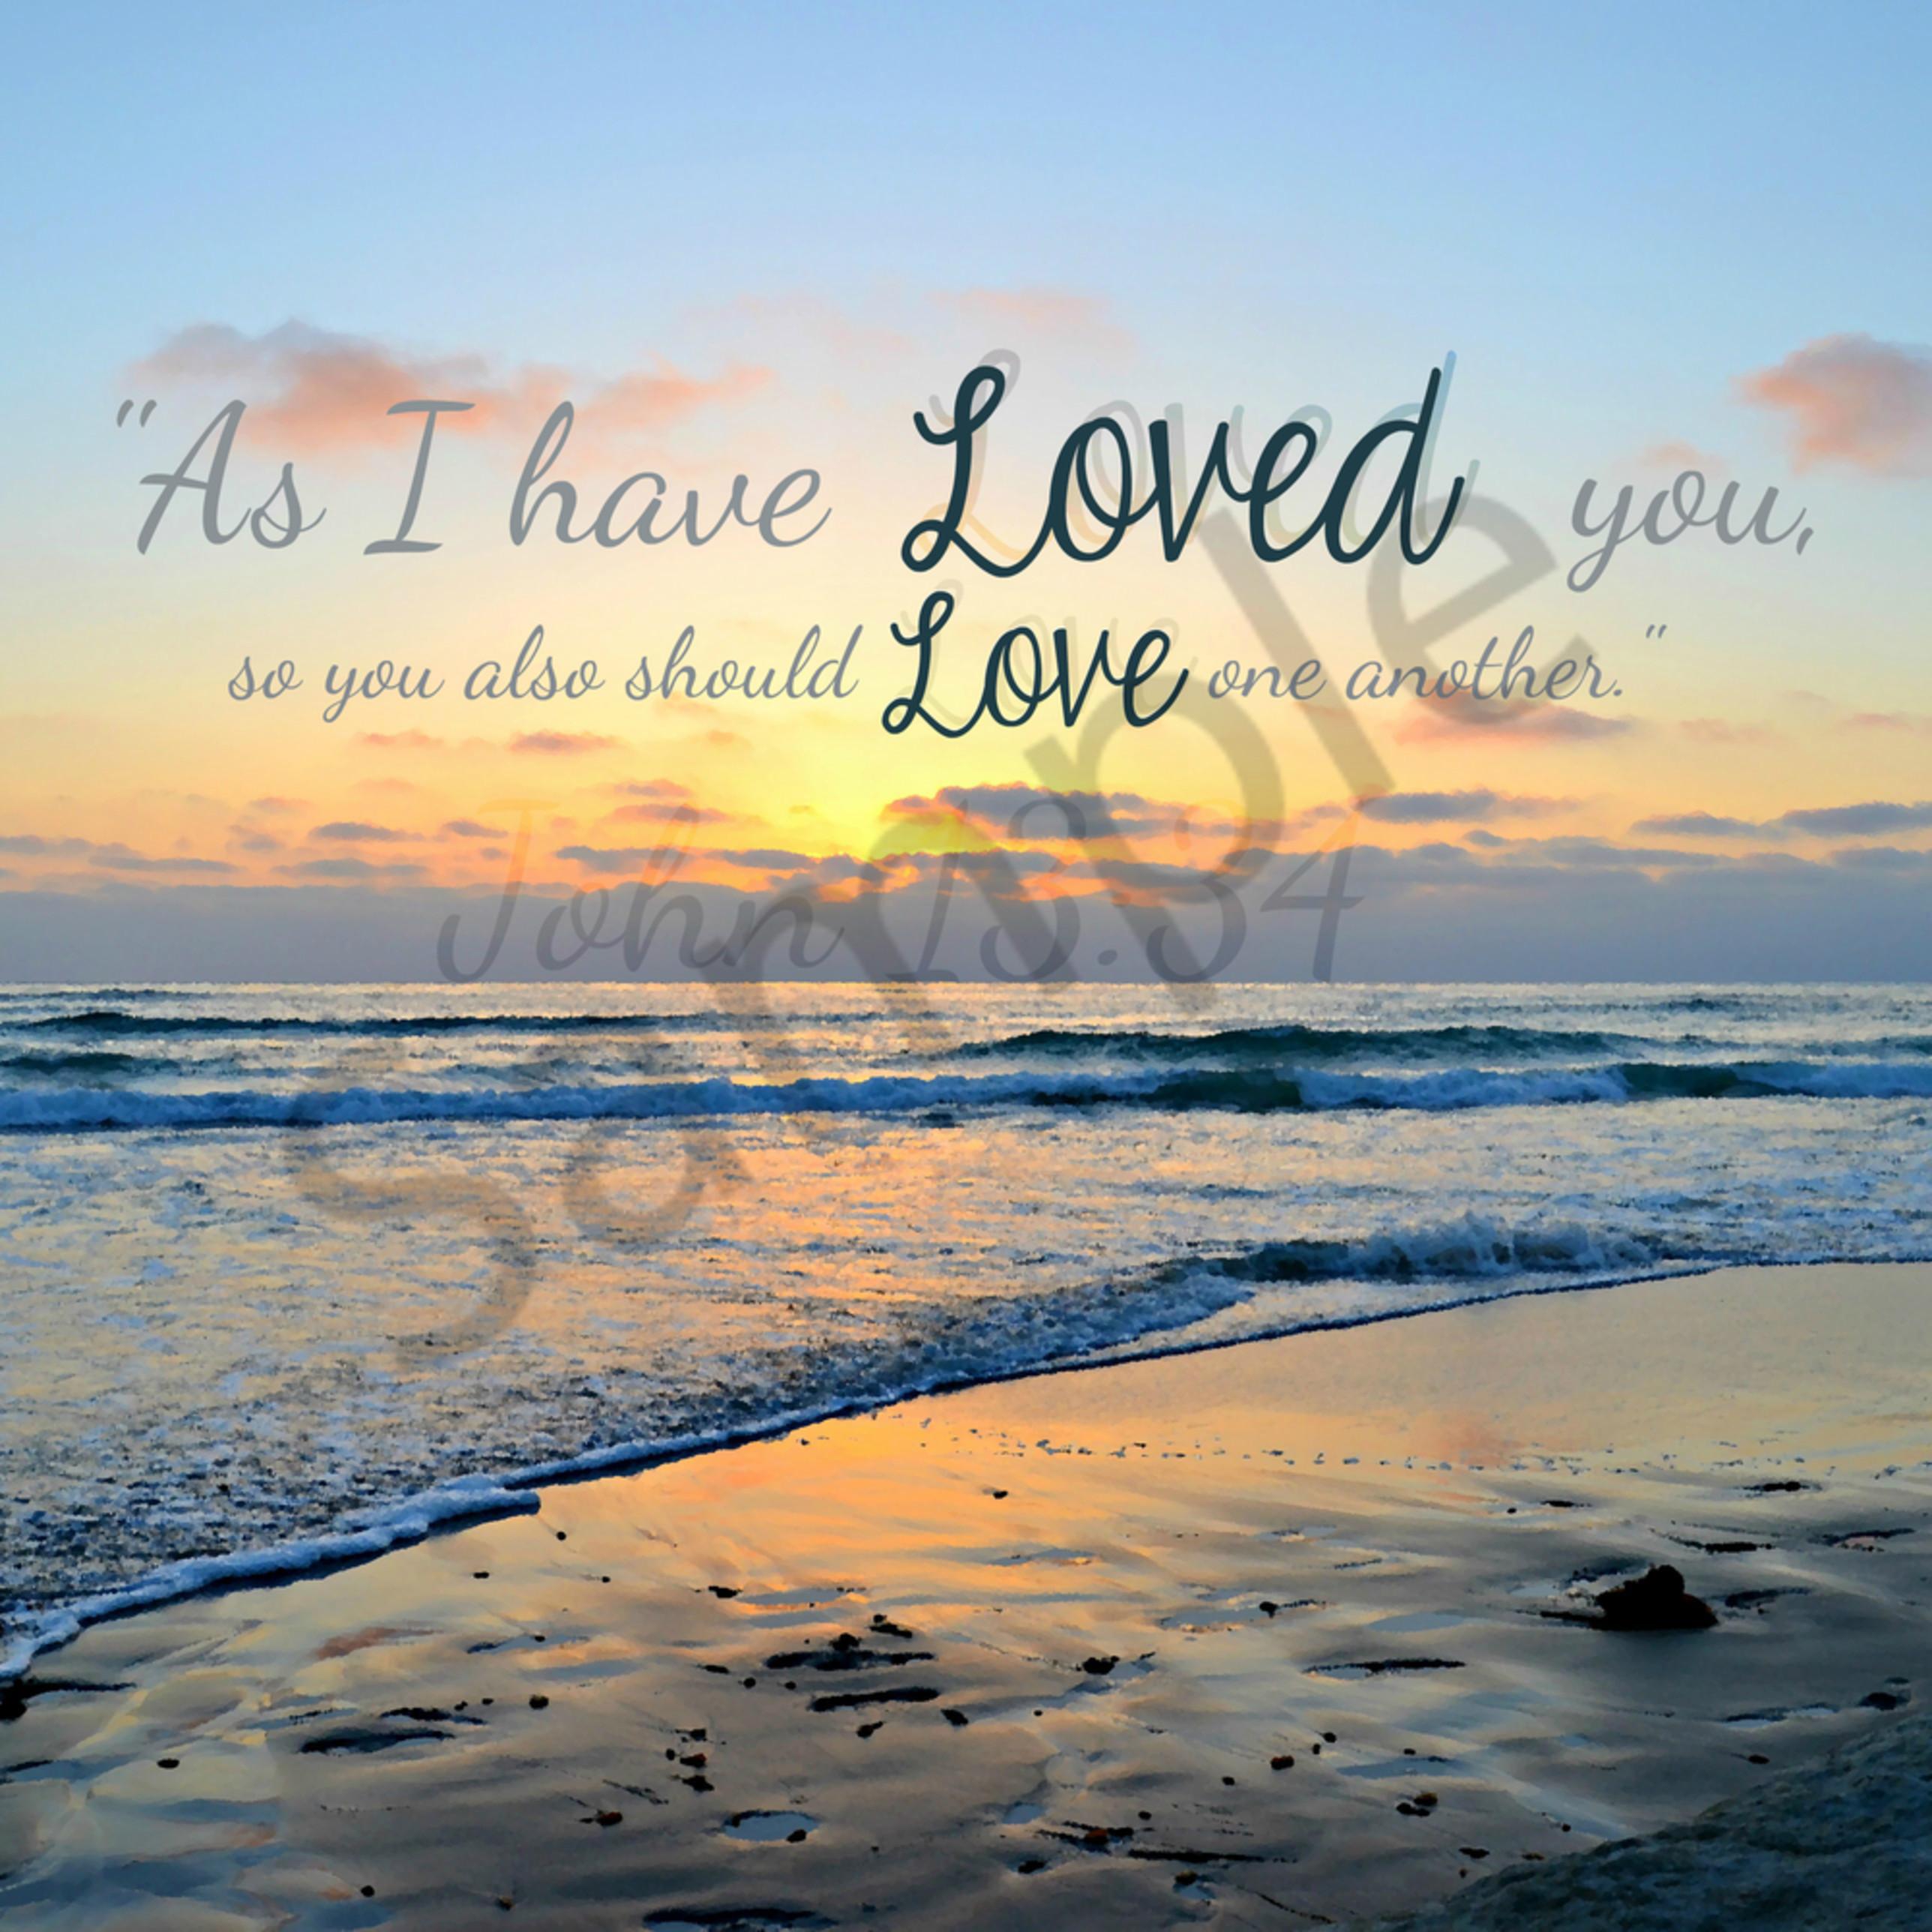 Love one another   dsc 2519 cardiff sunset clsshc   paint nk8ksz